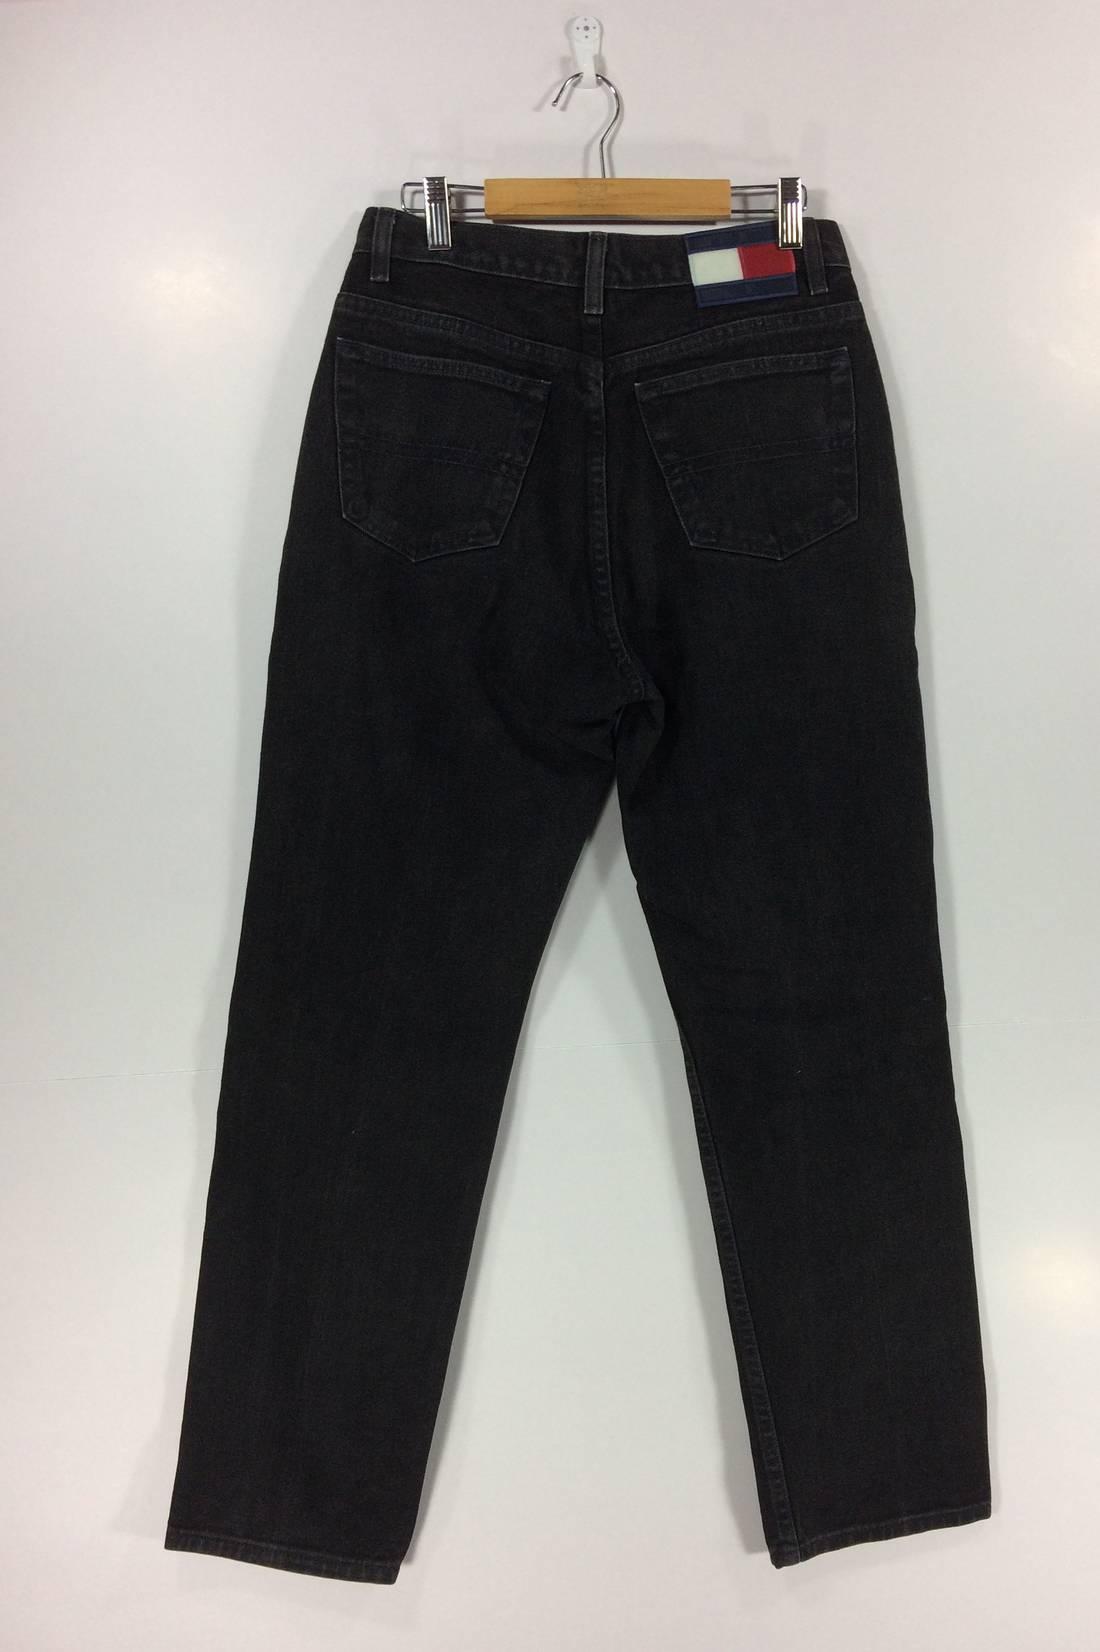 Vintage Tommy Hilfiger Jeans Swag 90s Hip Hop Style Big Size Streetwear Street Fashion Rare fEYCK